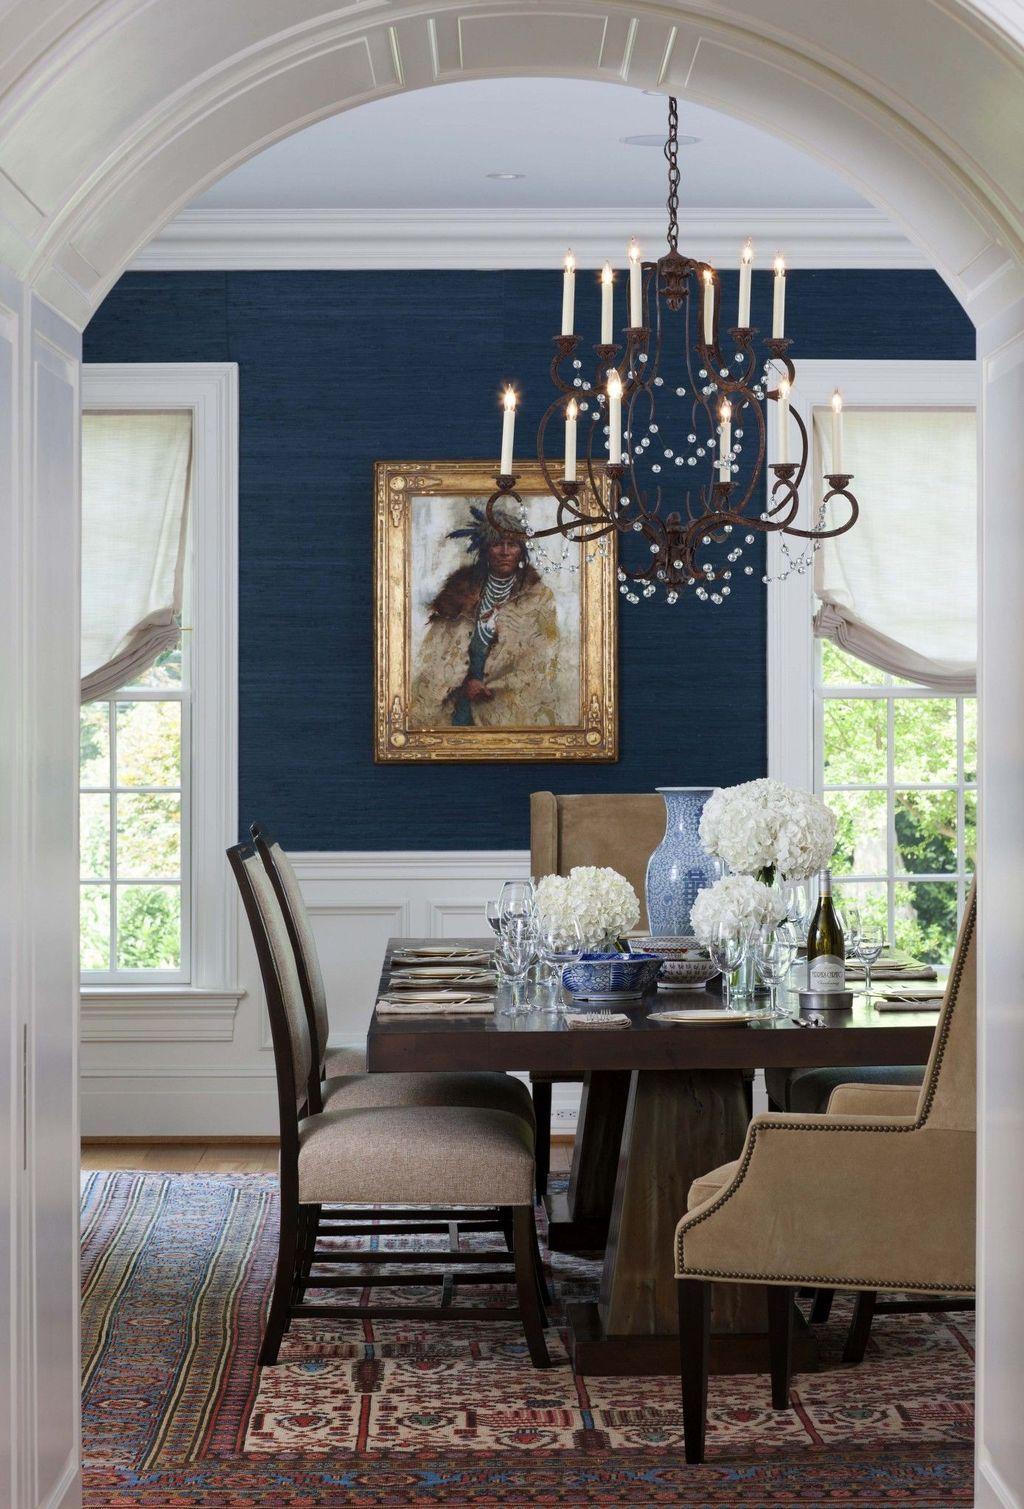 46 Stylish Victorian Dining Room Ideas Dining Room Blue Dining Room Curtains Dining Room Paint